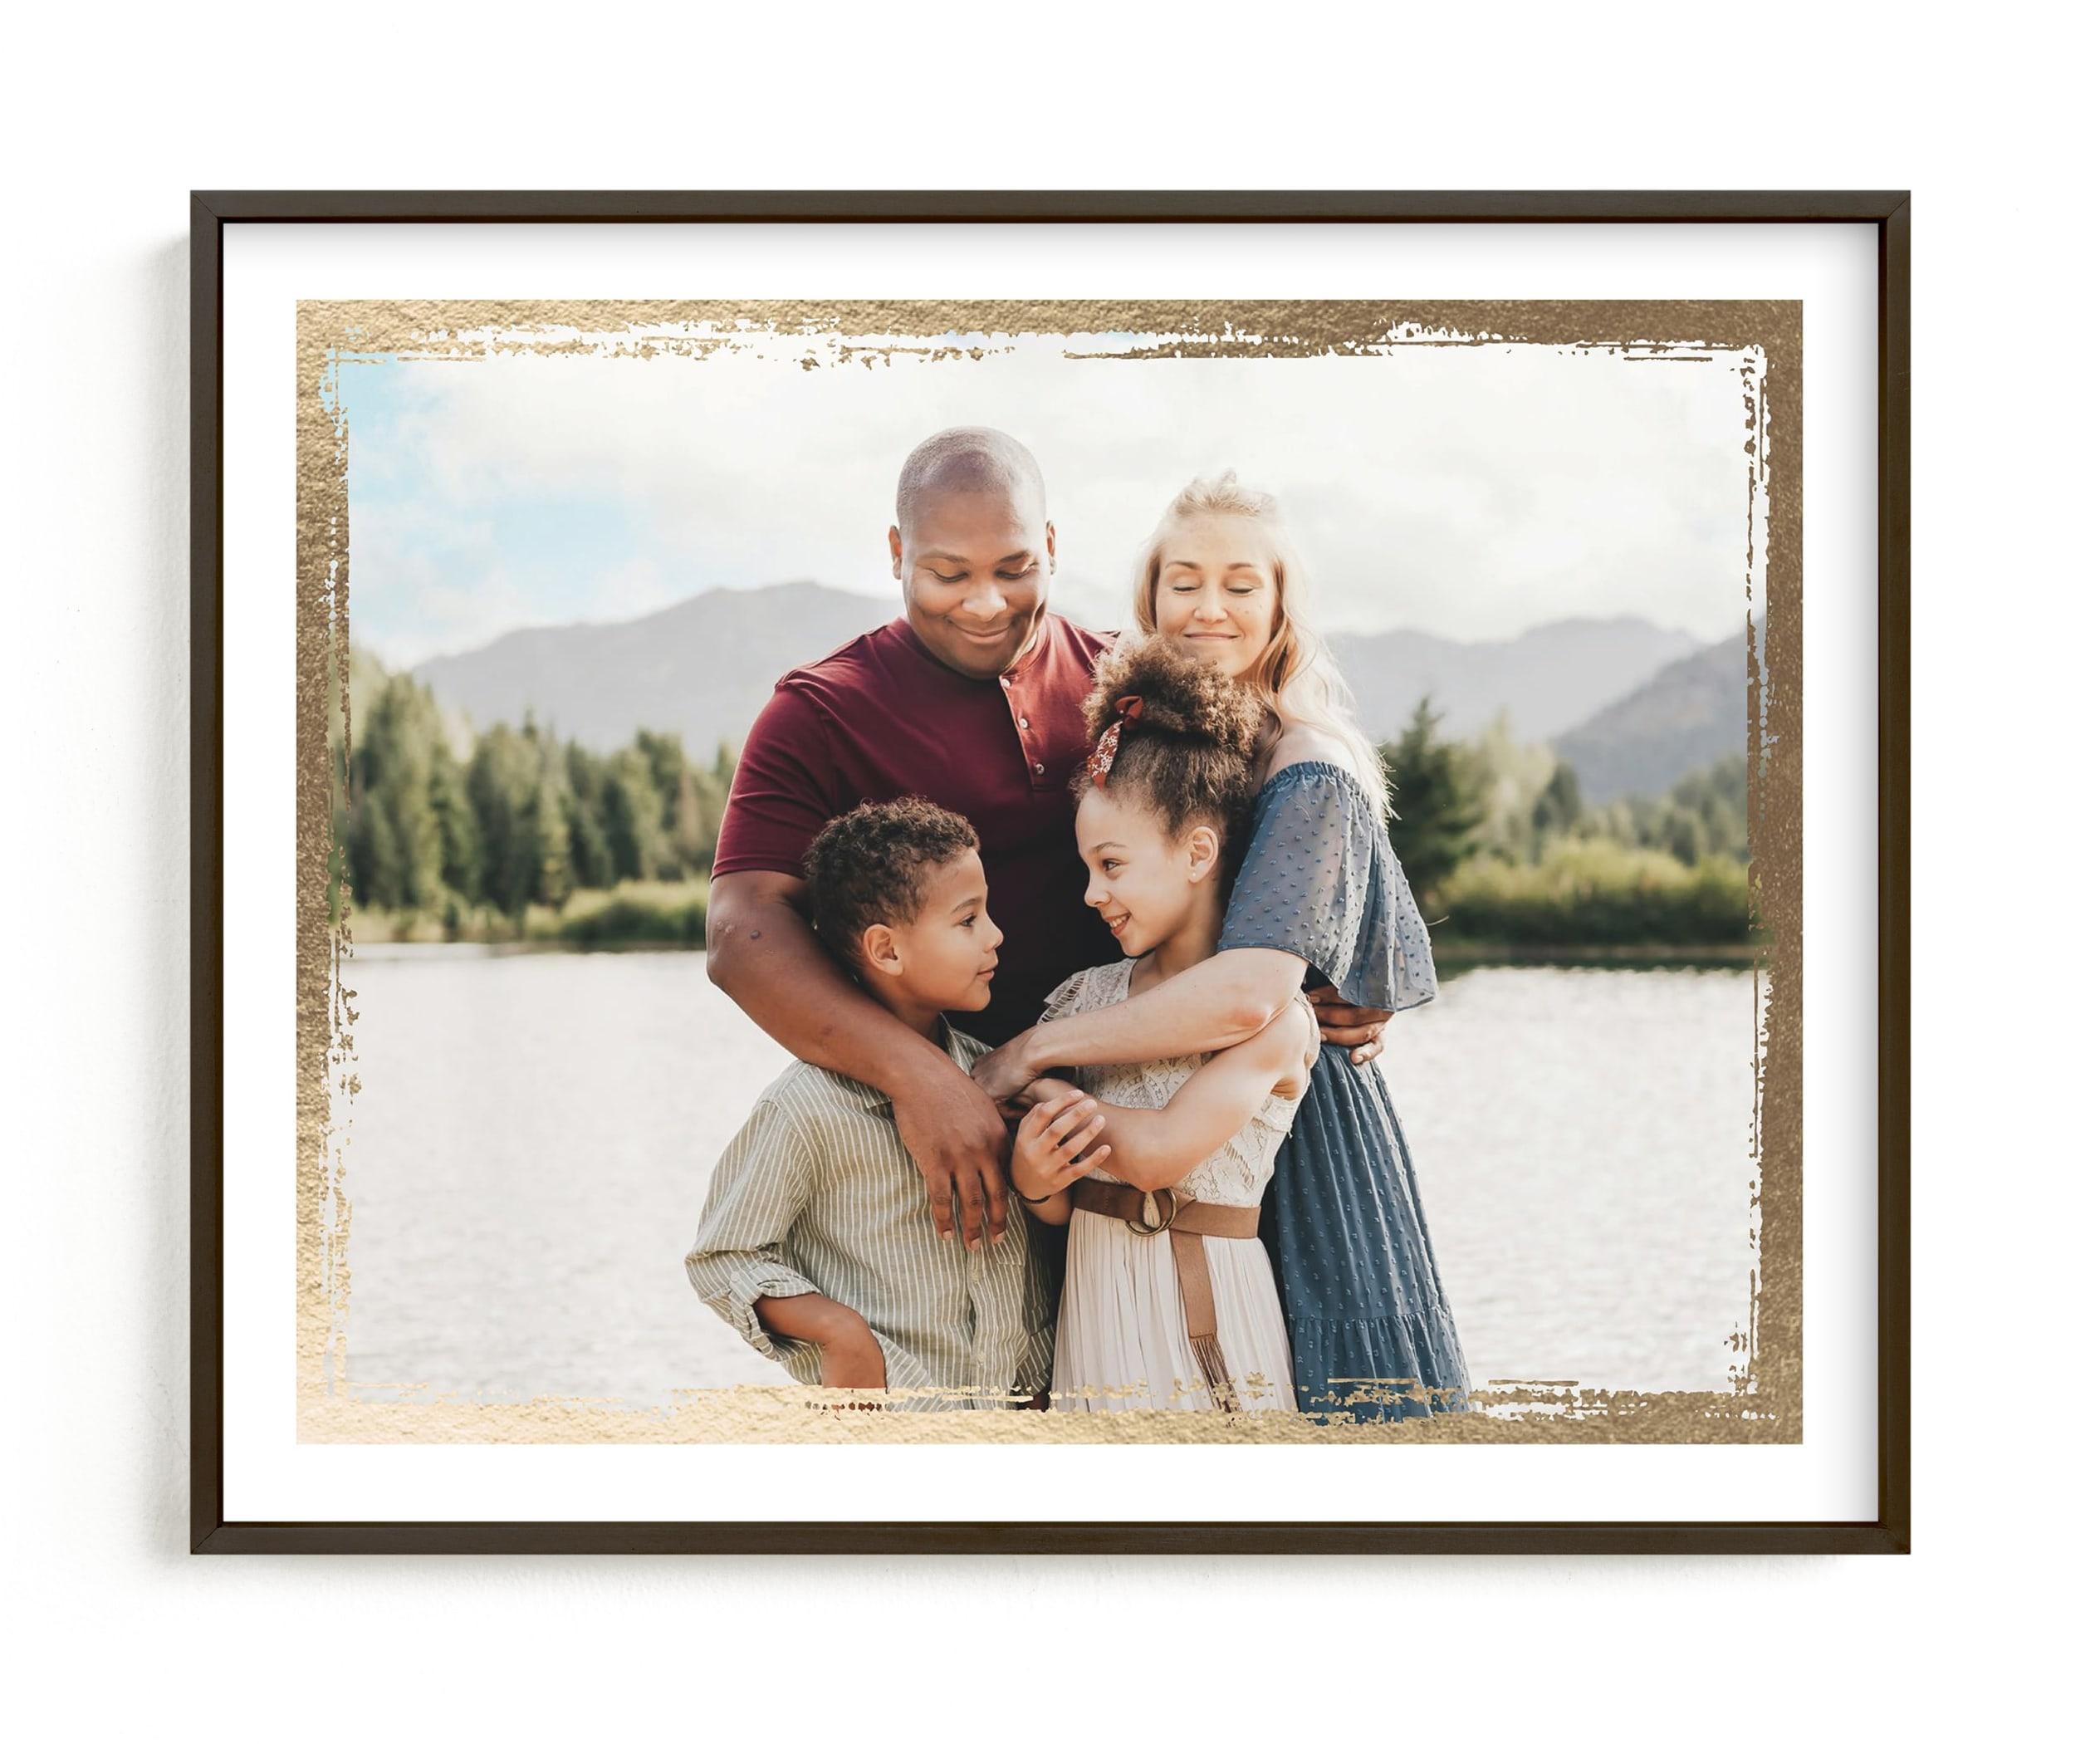 Rustic Frame Foil Pressed Photo Art Print